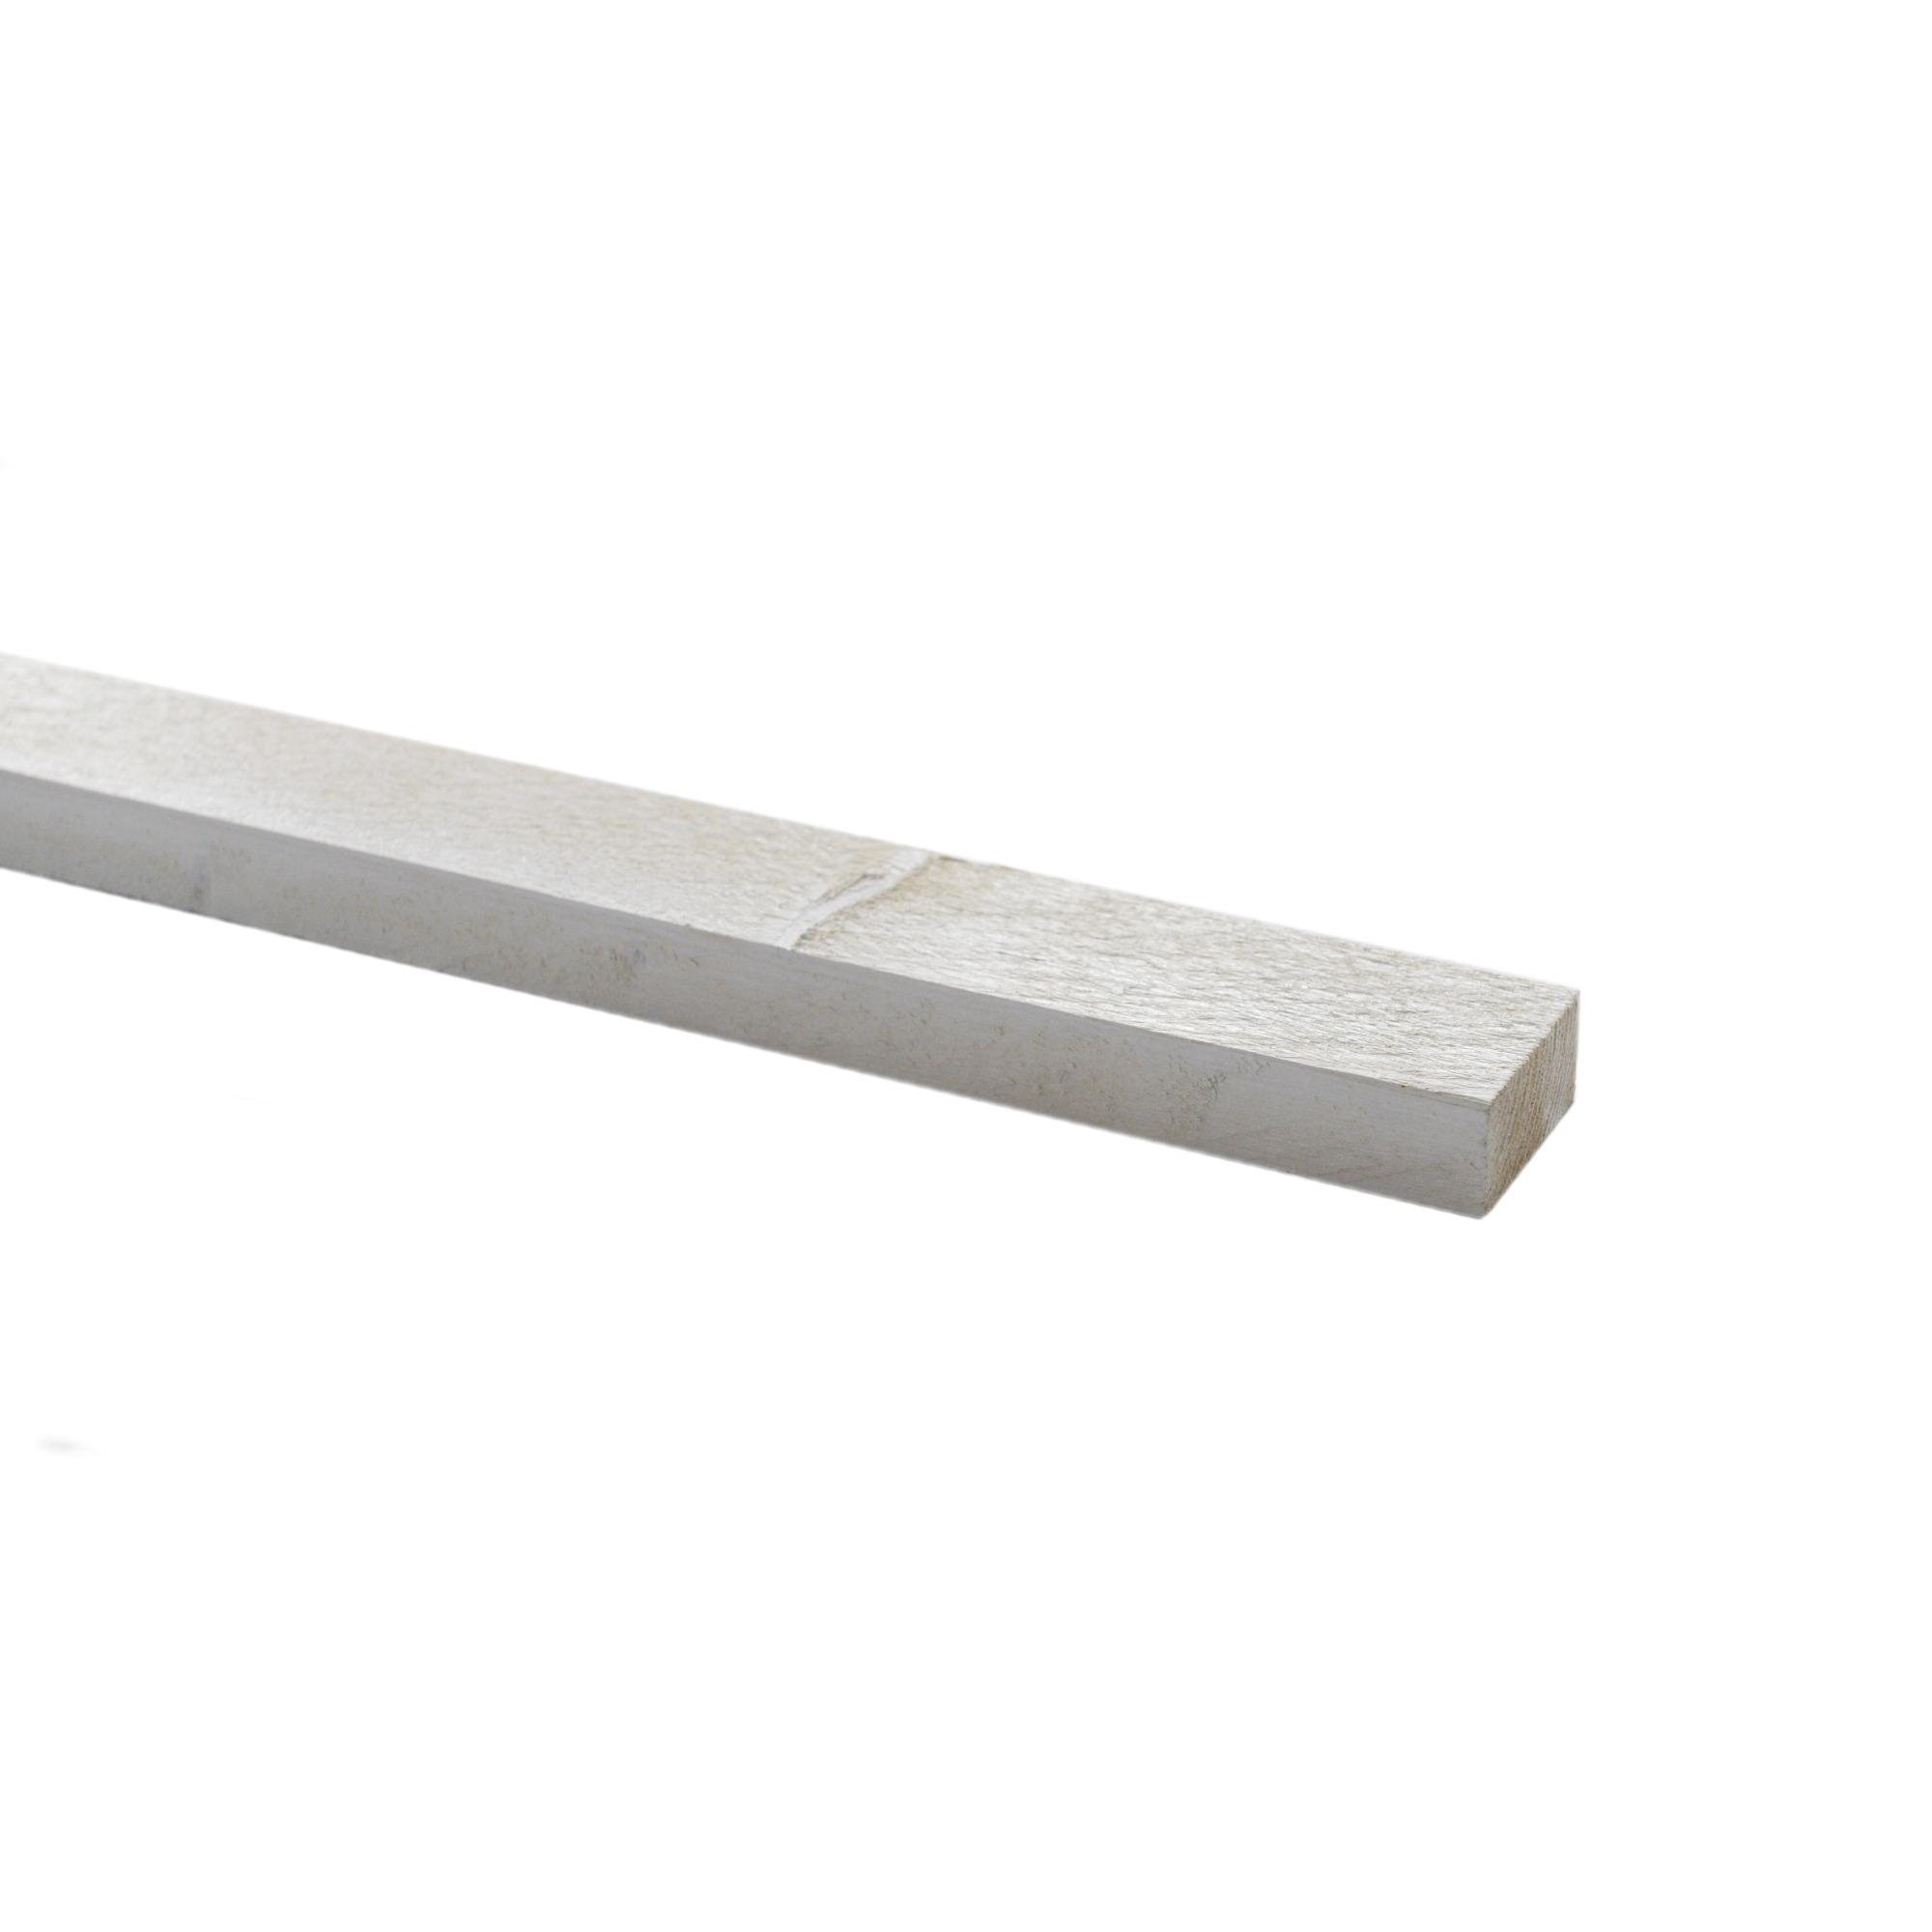 Steigerhouten lat geborsteld ca. 30x62 mm, lengte 250 cm wit